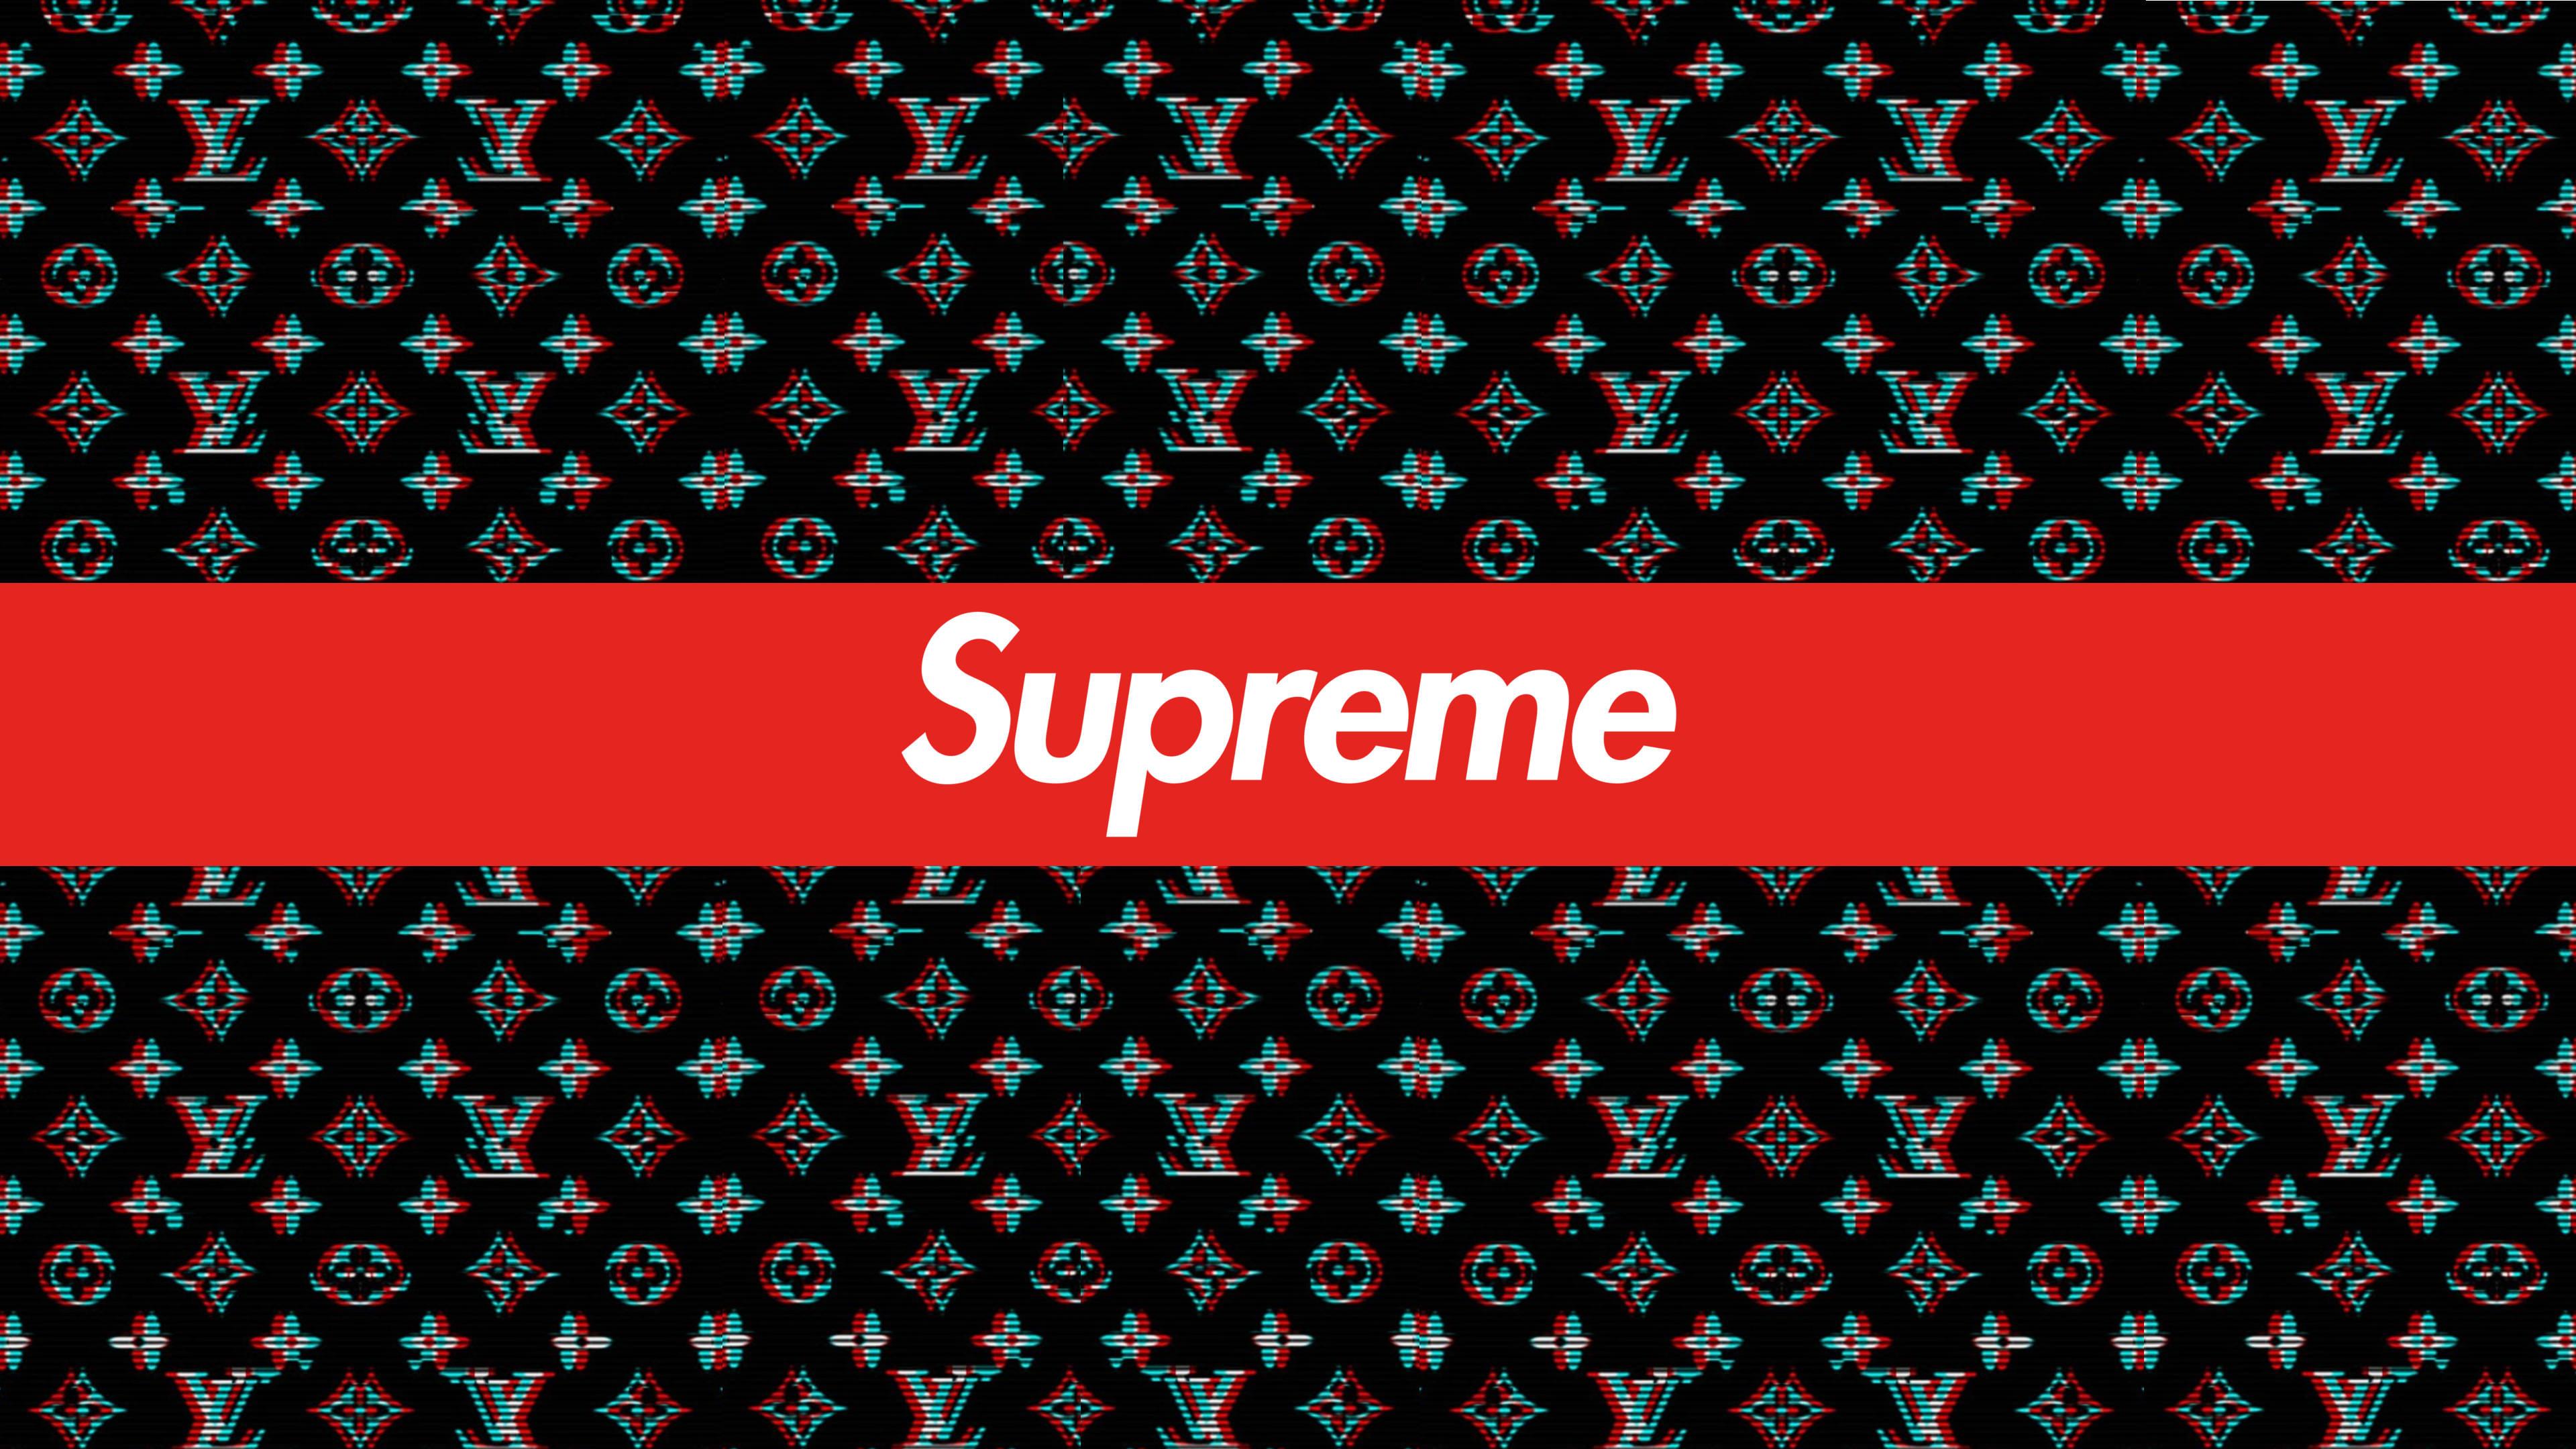 83 Supreme Wallpapers on WallpaperPlay 3840x2160